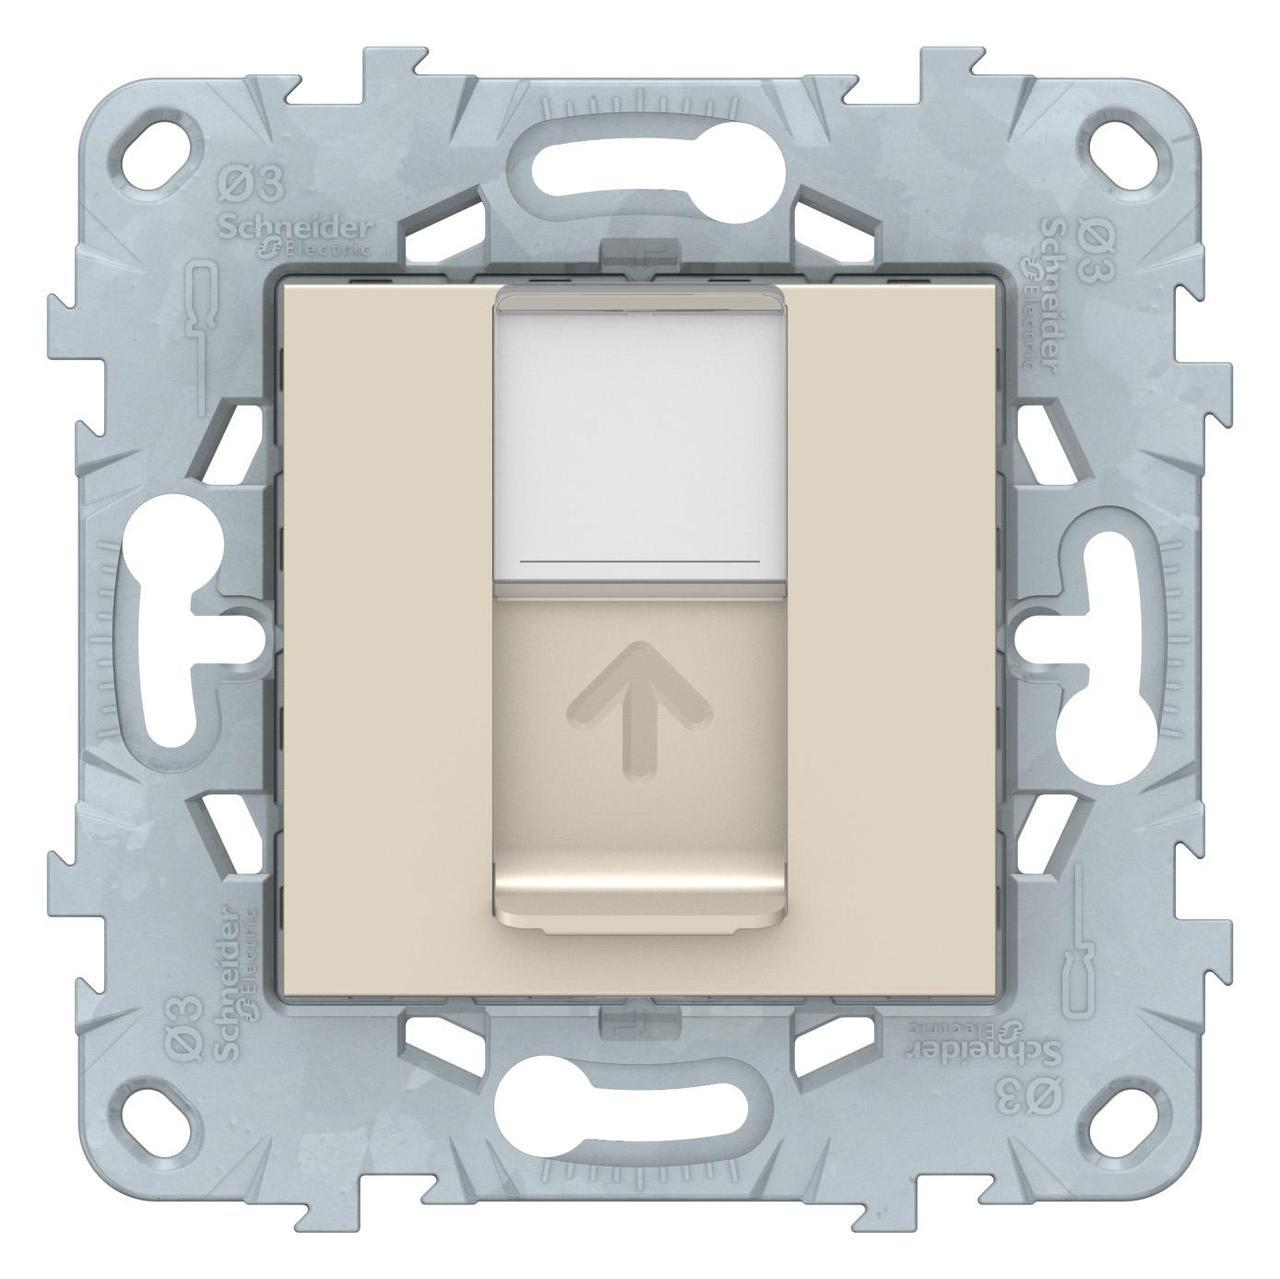 Розетка компьютерная 1-ая кат.5е, RJ-45 (интернет) , Бежевый, серия Unica New, Schneider Electric